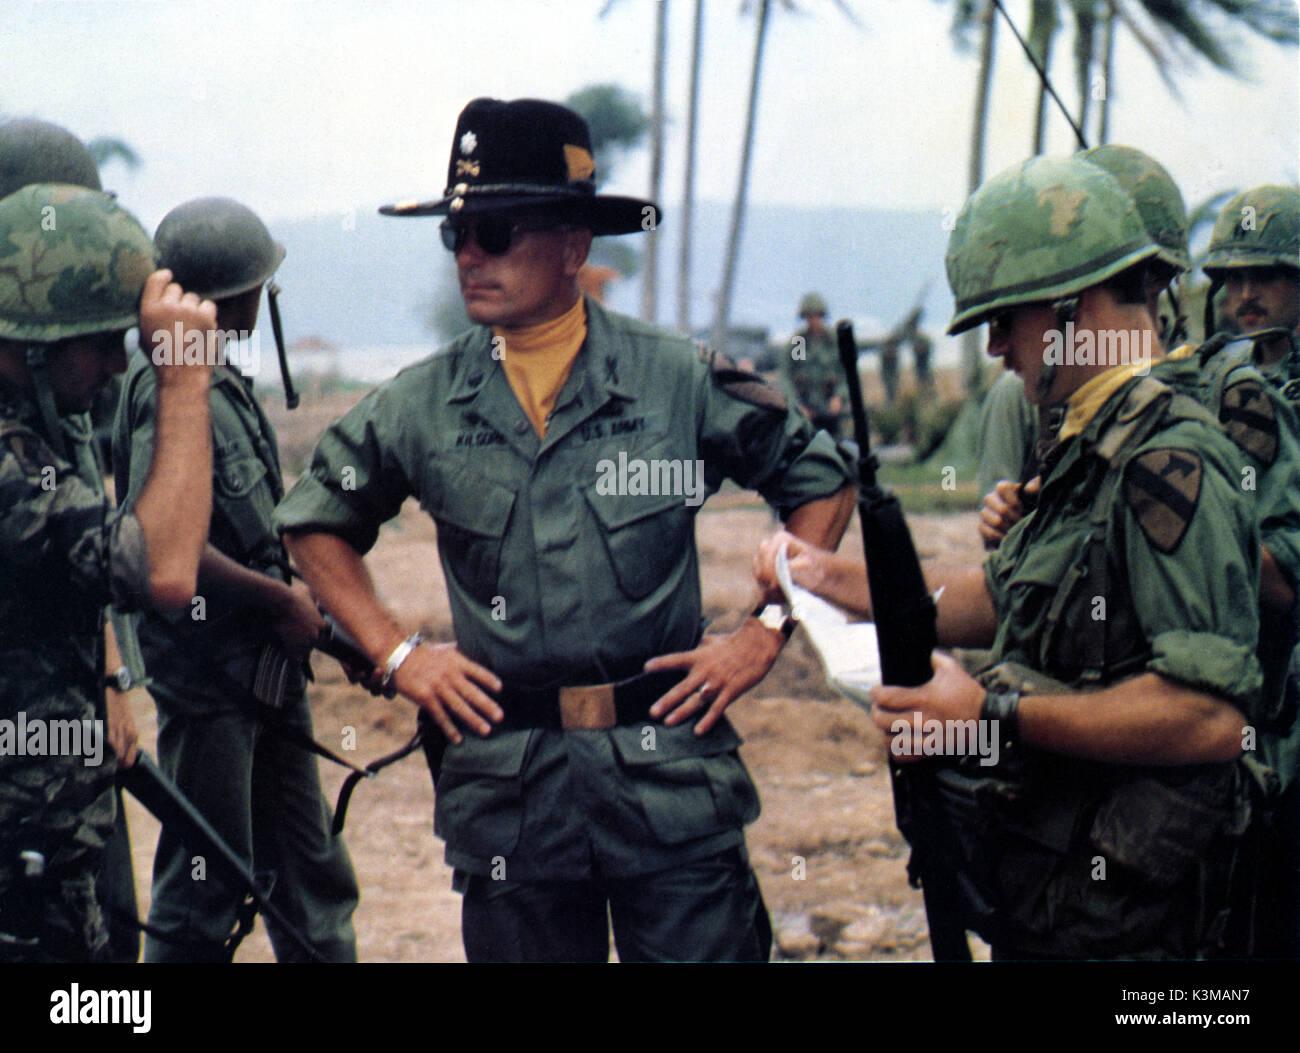 Us Kilgore Dispatcher: APOCALYPSE NOW [US 1979] ROBERT DUVALL [centre] As Kilgore